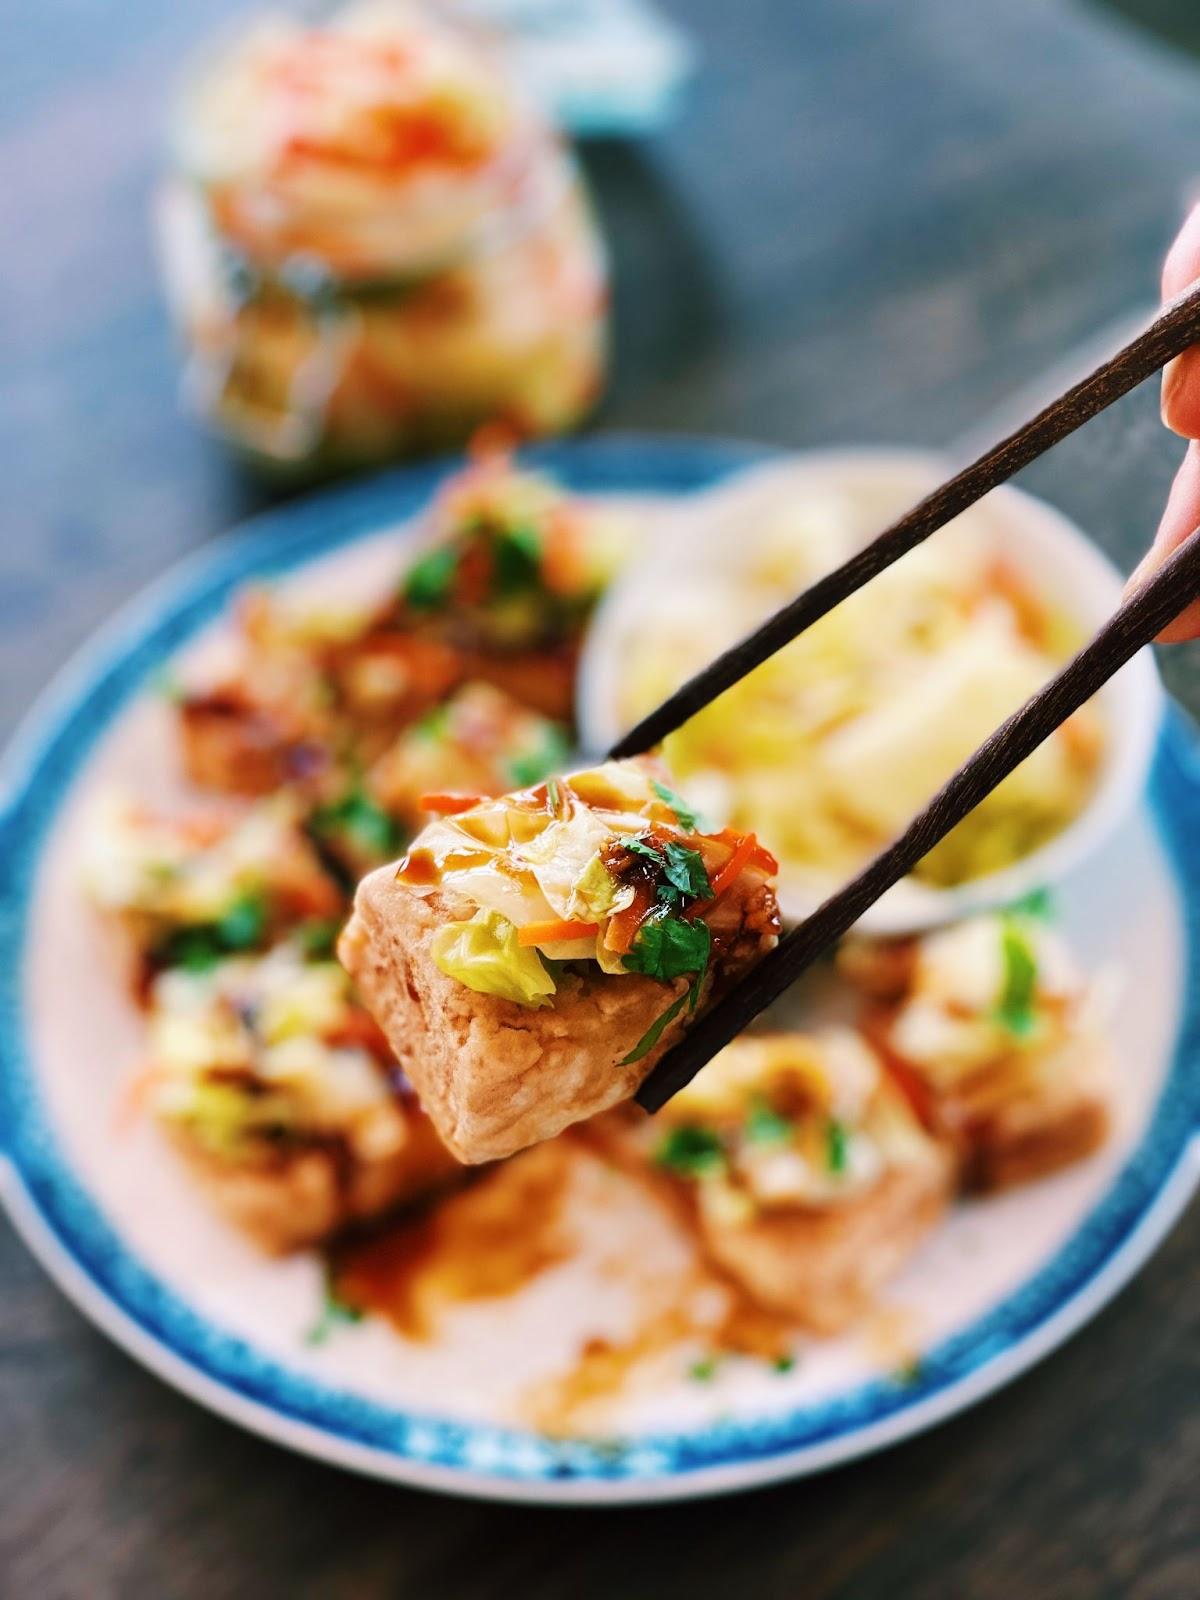 Crispy Fried Tofu with Garlic Sauce